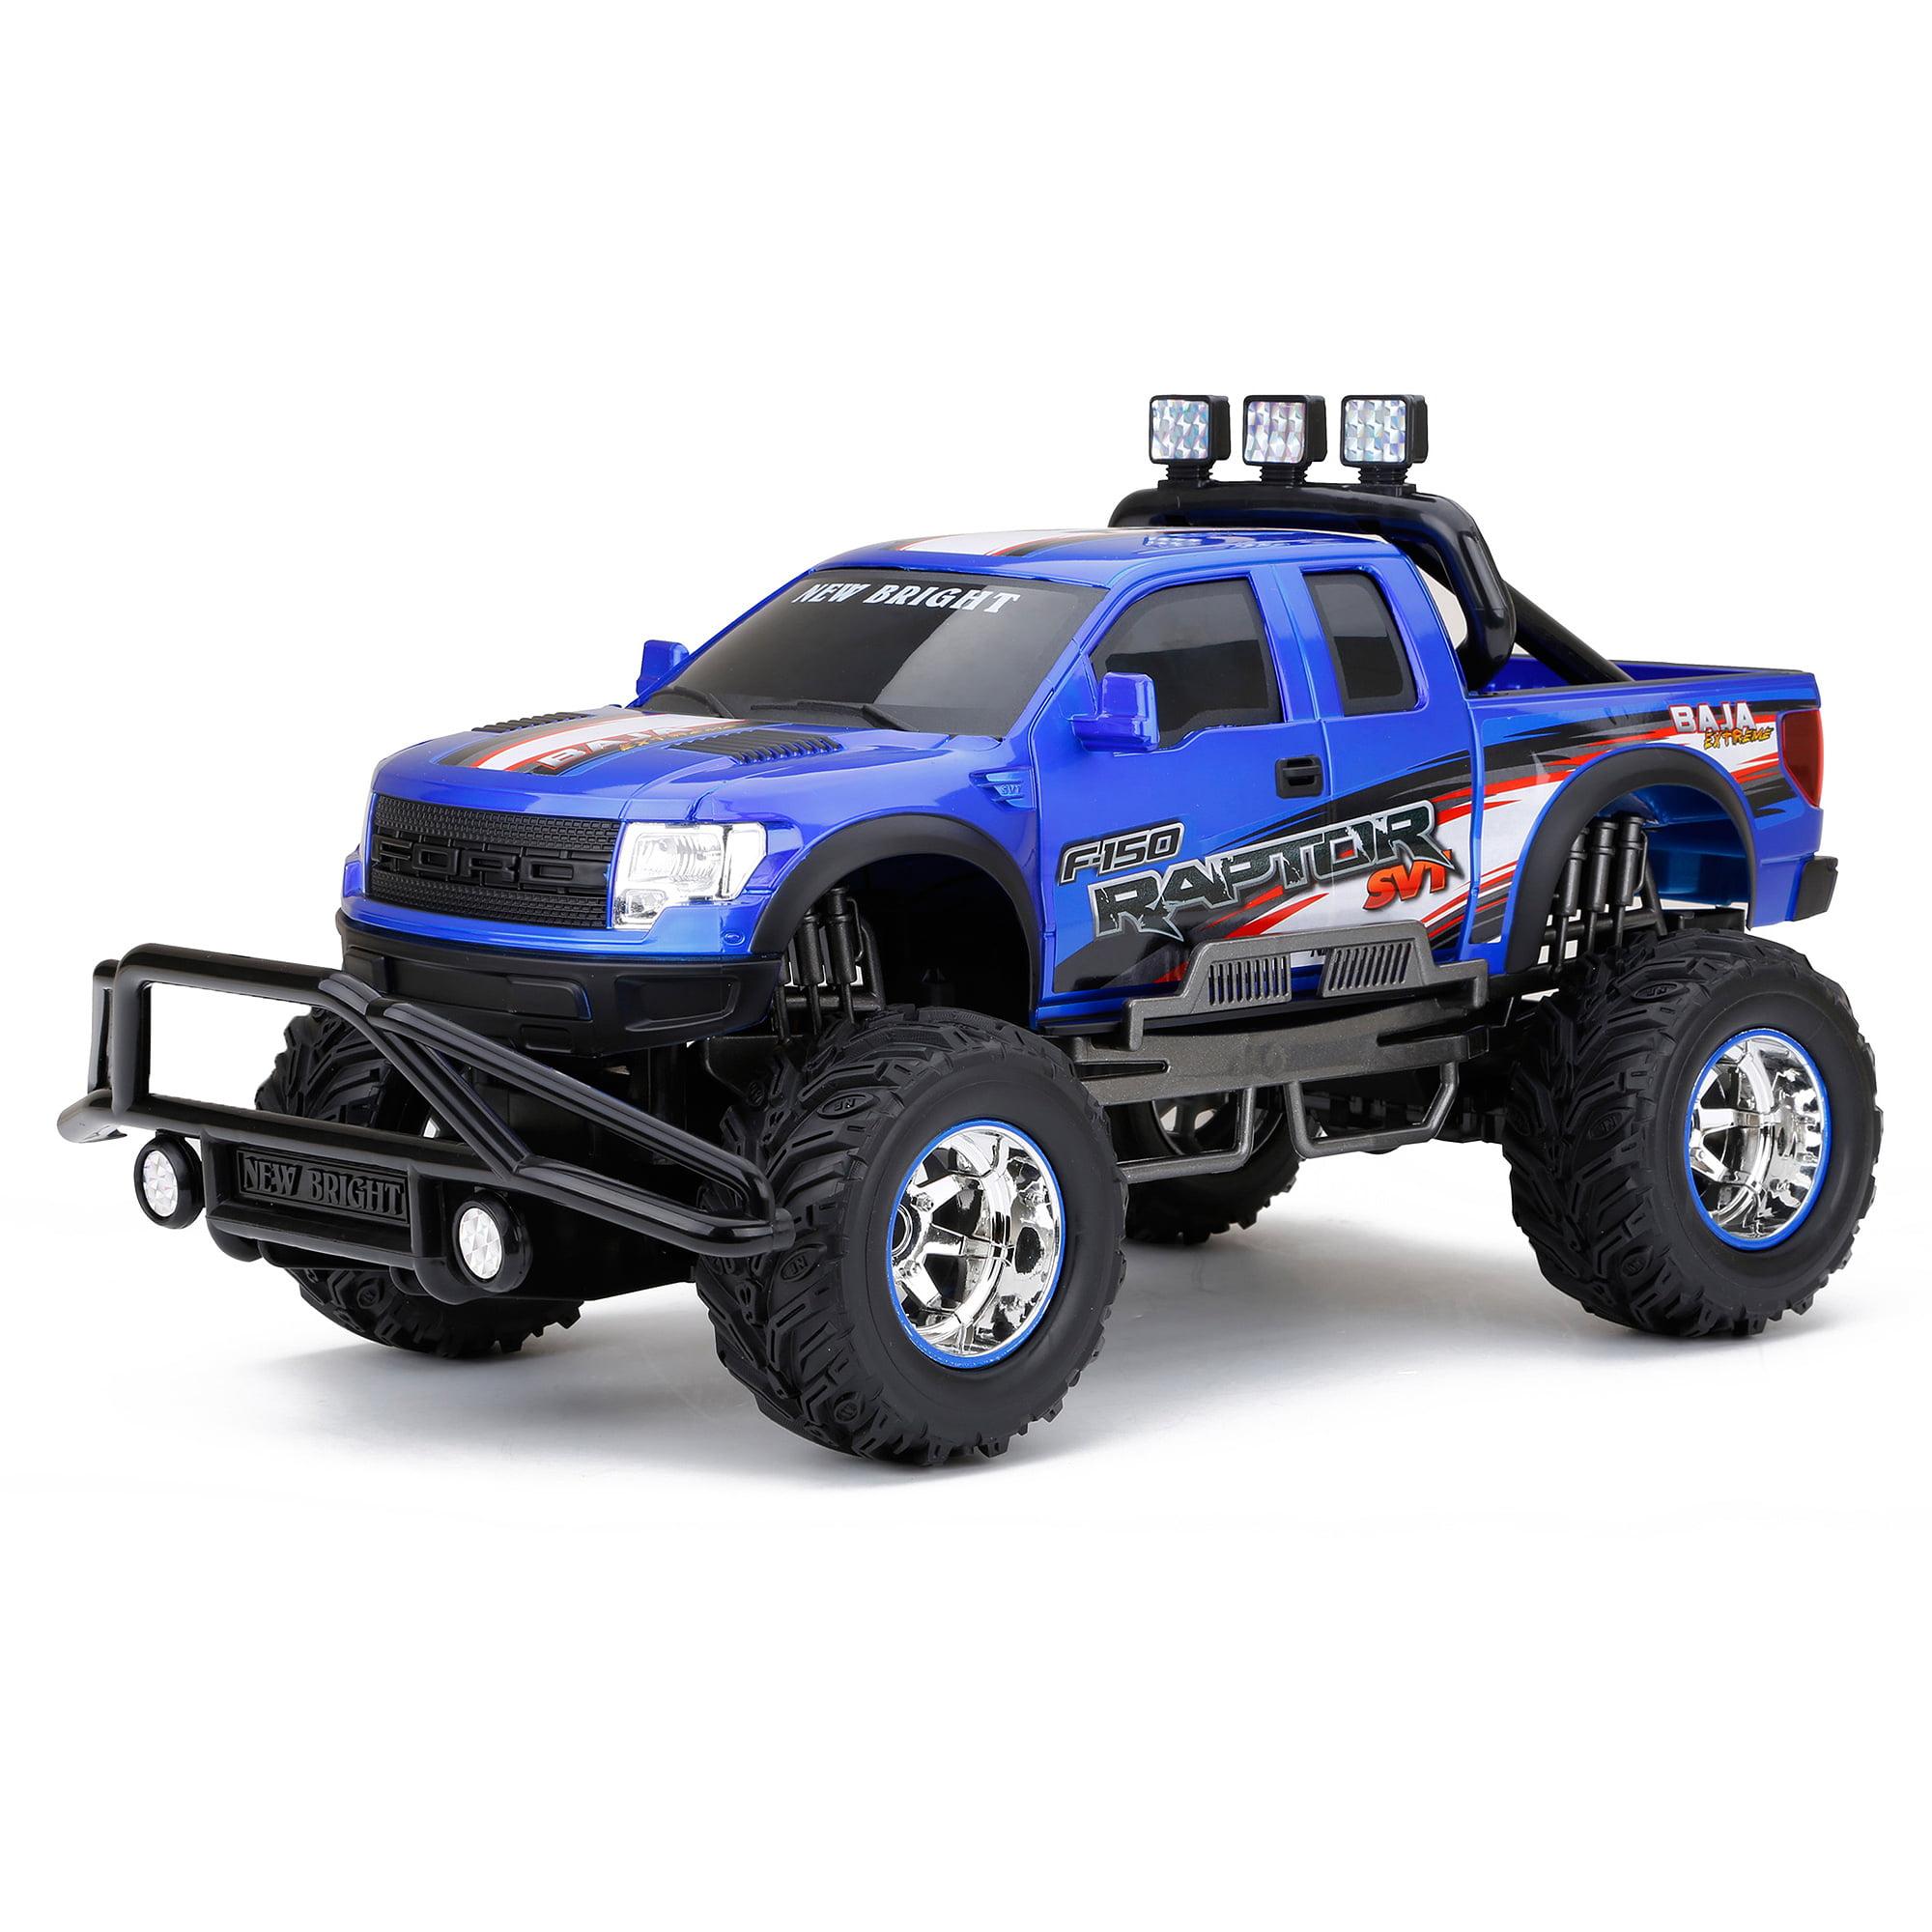 Remote Control Truck Baja Extreme Mopar Ford Rapture Ram